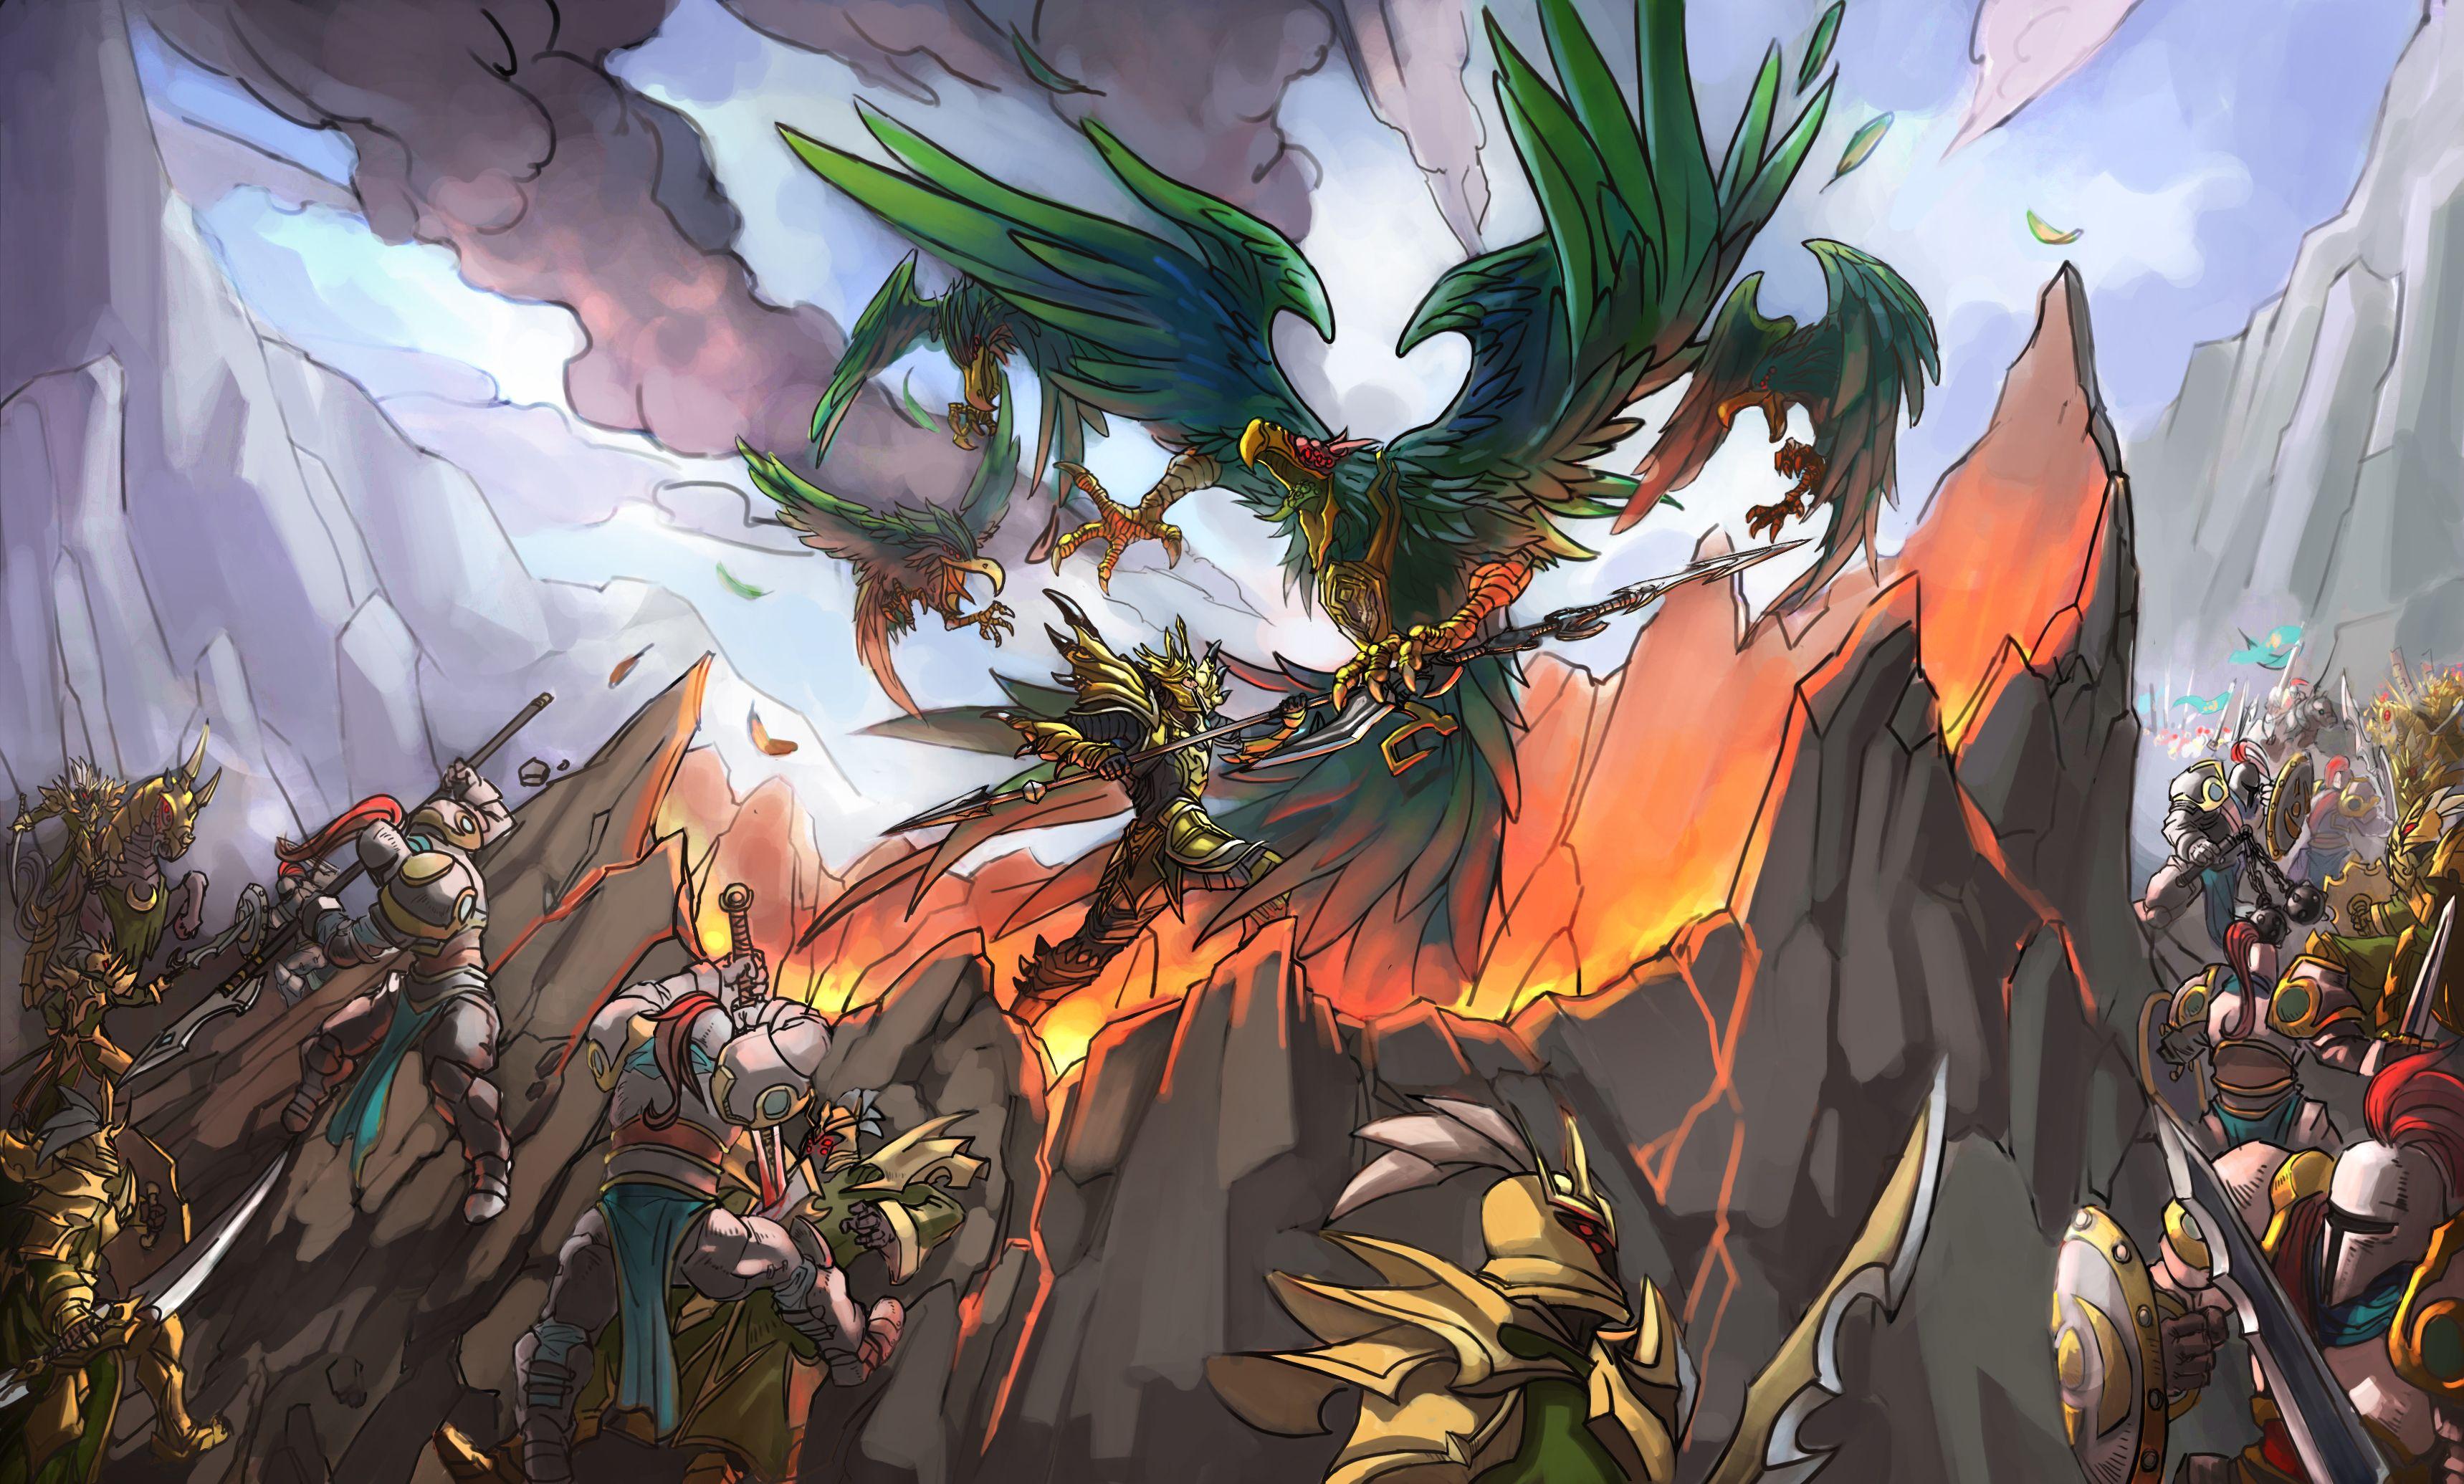 J4 vs Swain. League of legends, Art, Abstract artwork